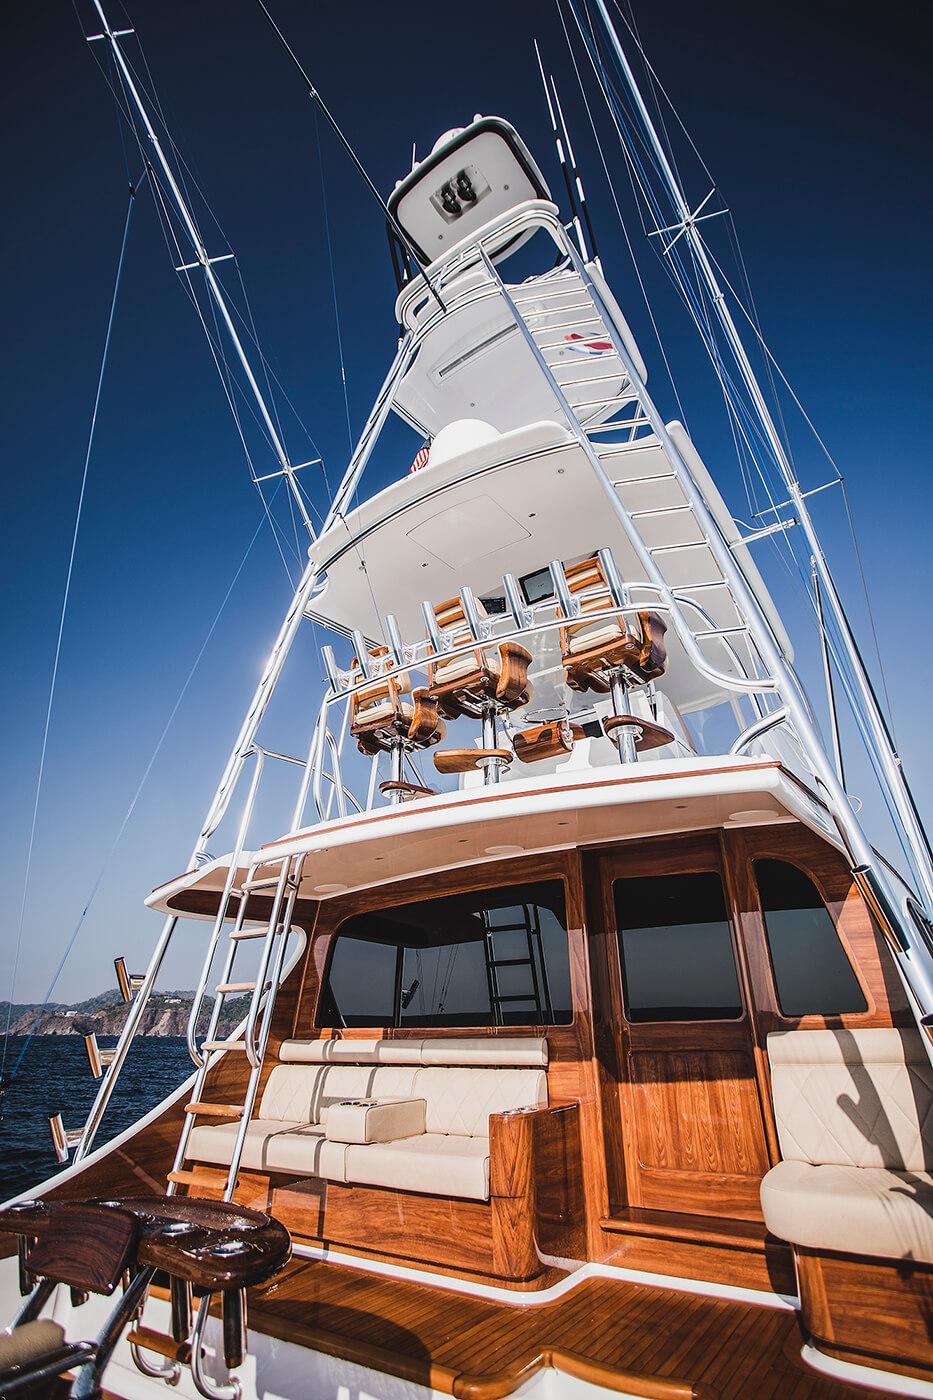 Blue Eagle Houston Texas Faux Teak helm pod bulkhead mezzanine planks wooden